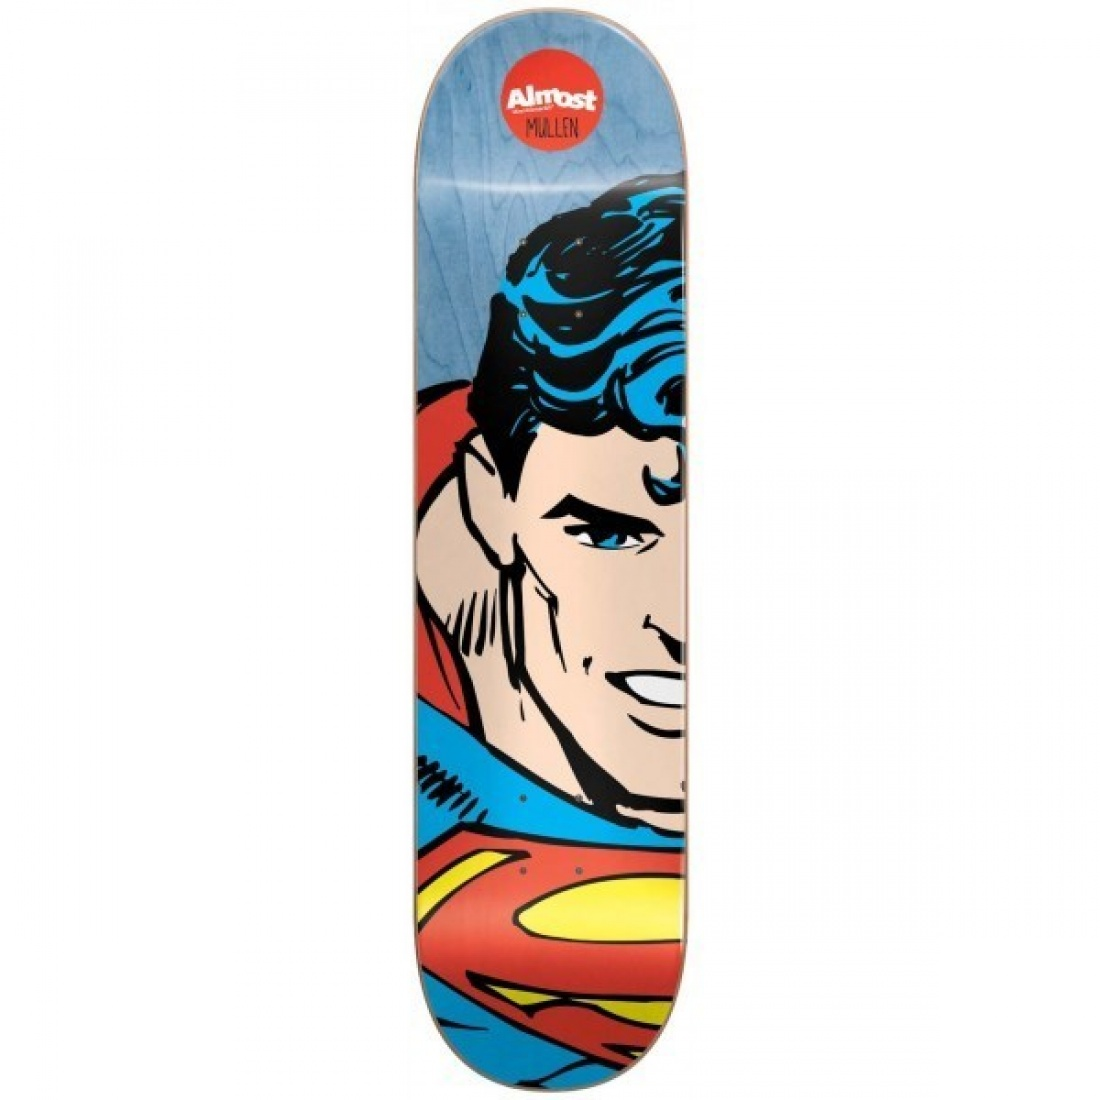 ALM-Superhero Splitface Rodney Mullen R7 8.125 Deck